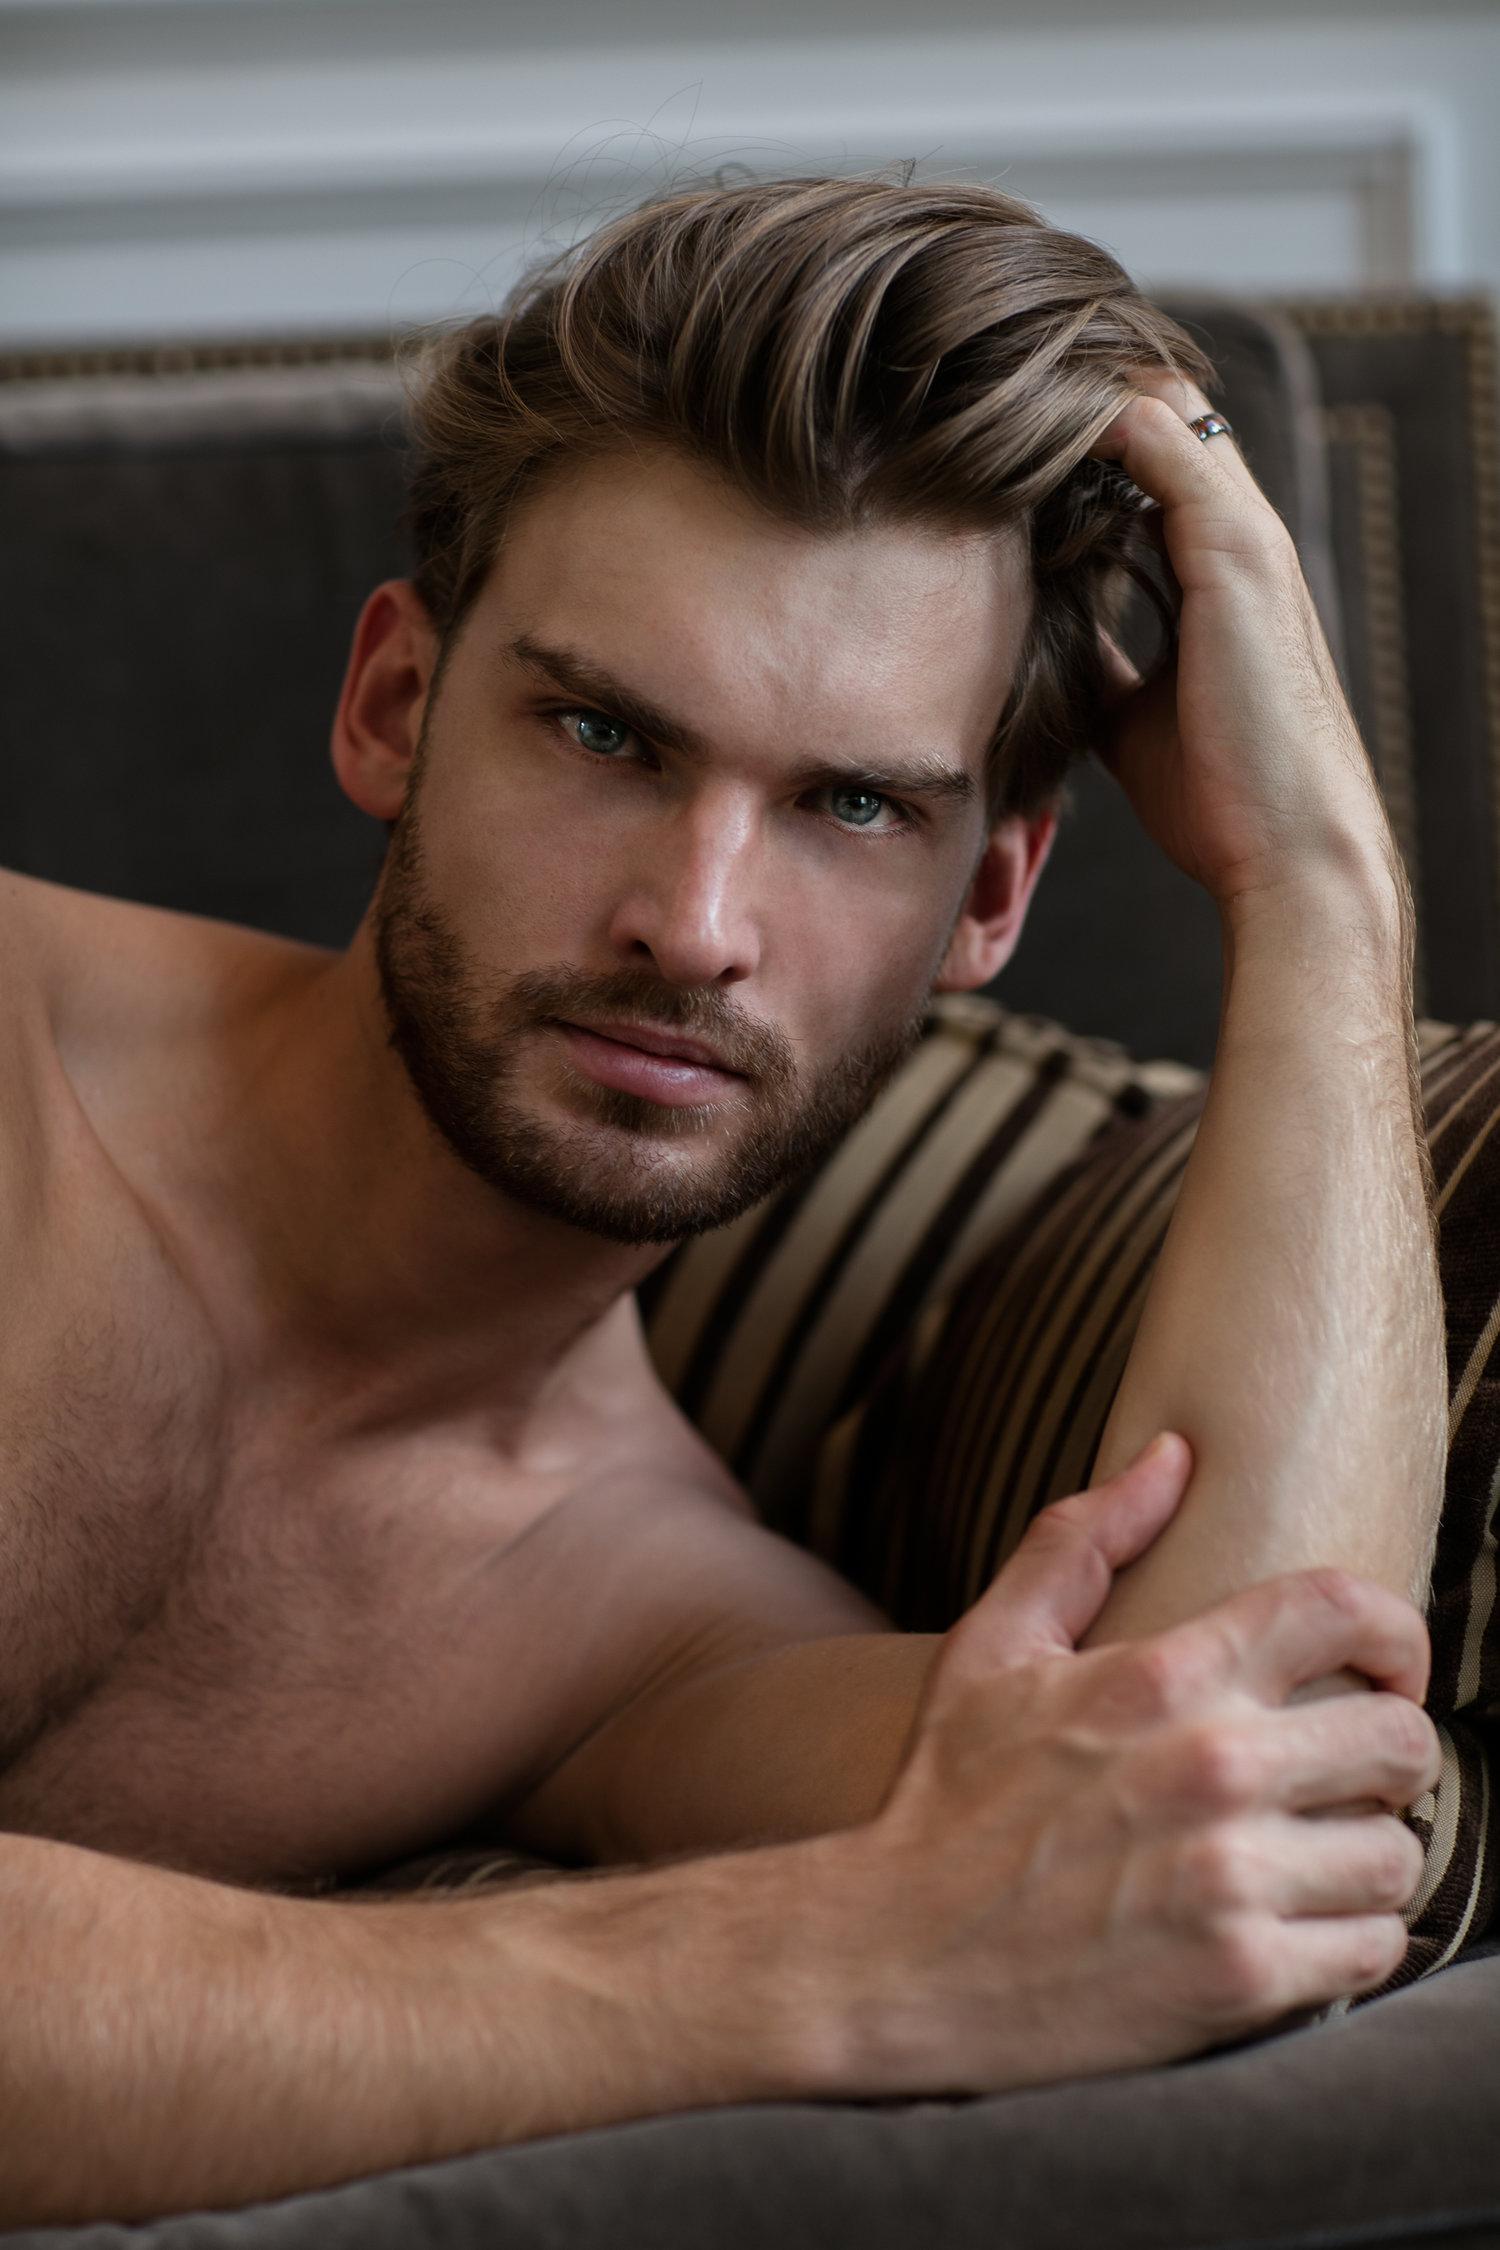 Adon Exclusive: Model Mario Skaric By Tom Saint Clair